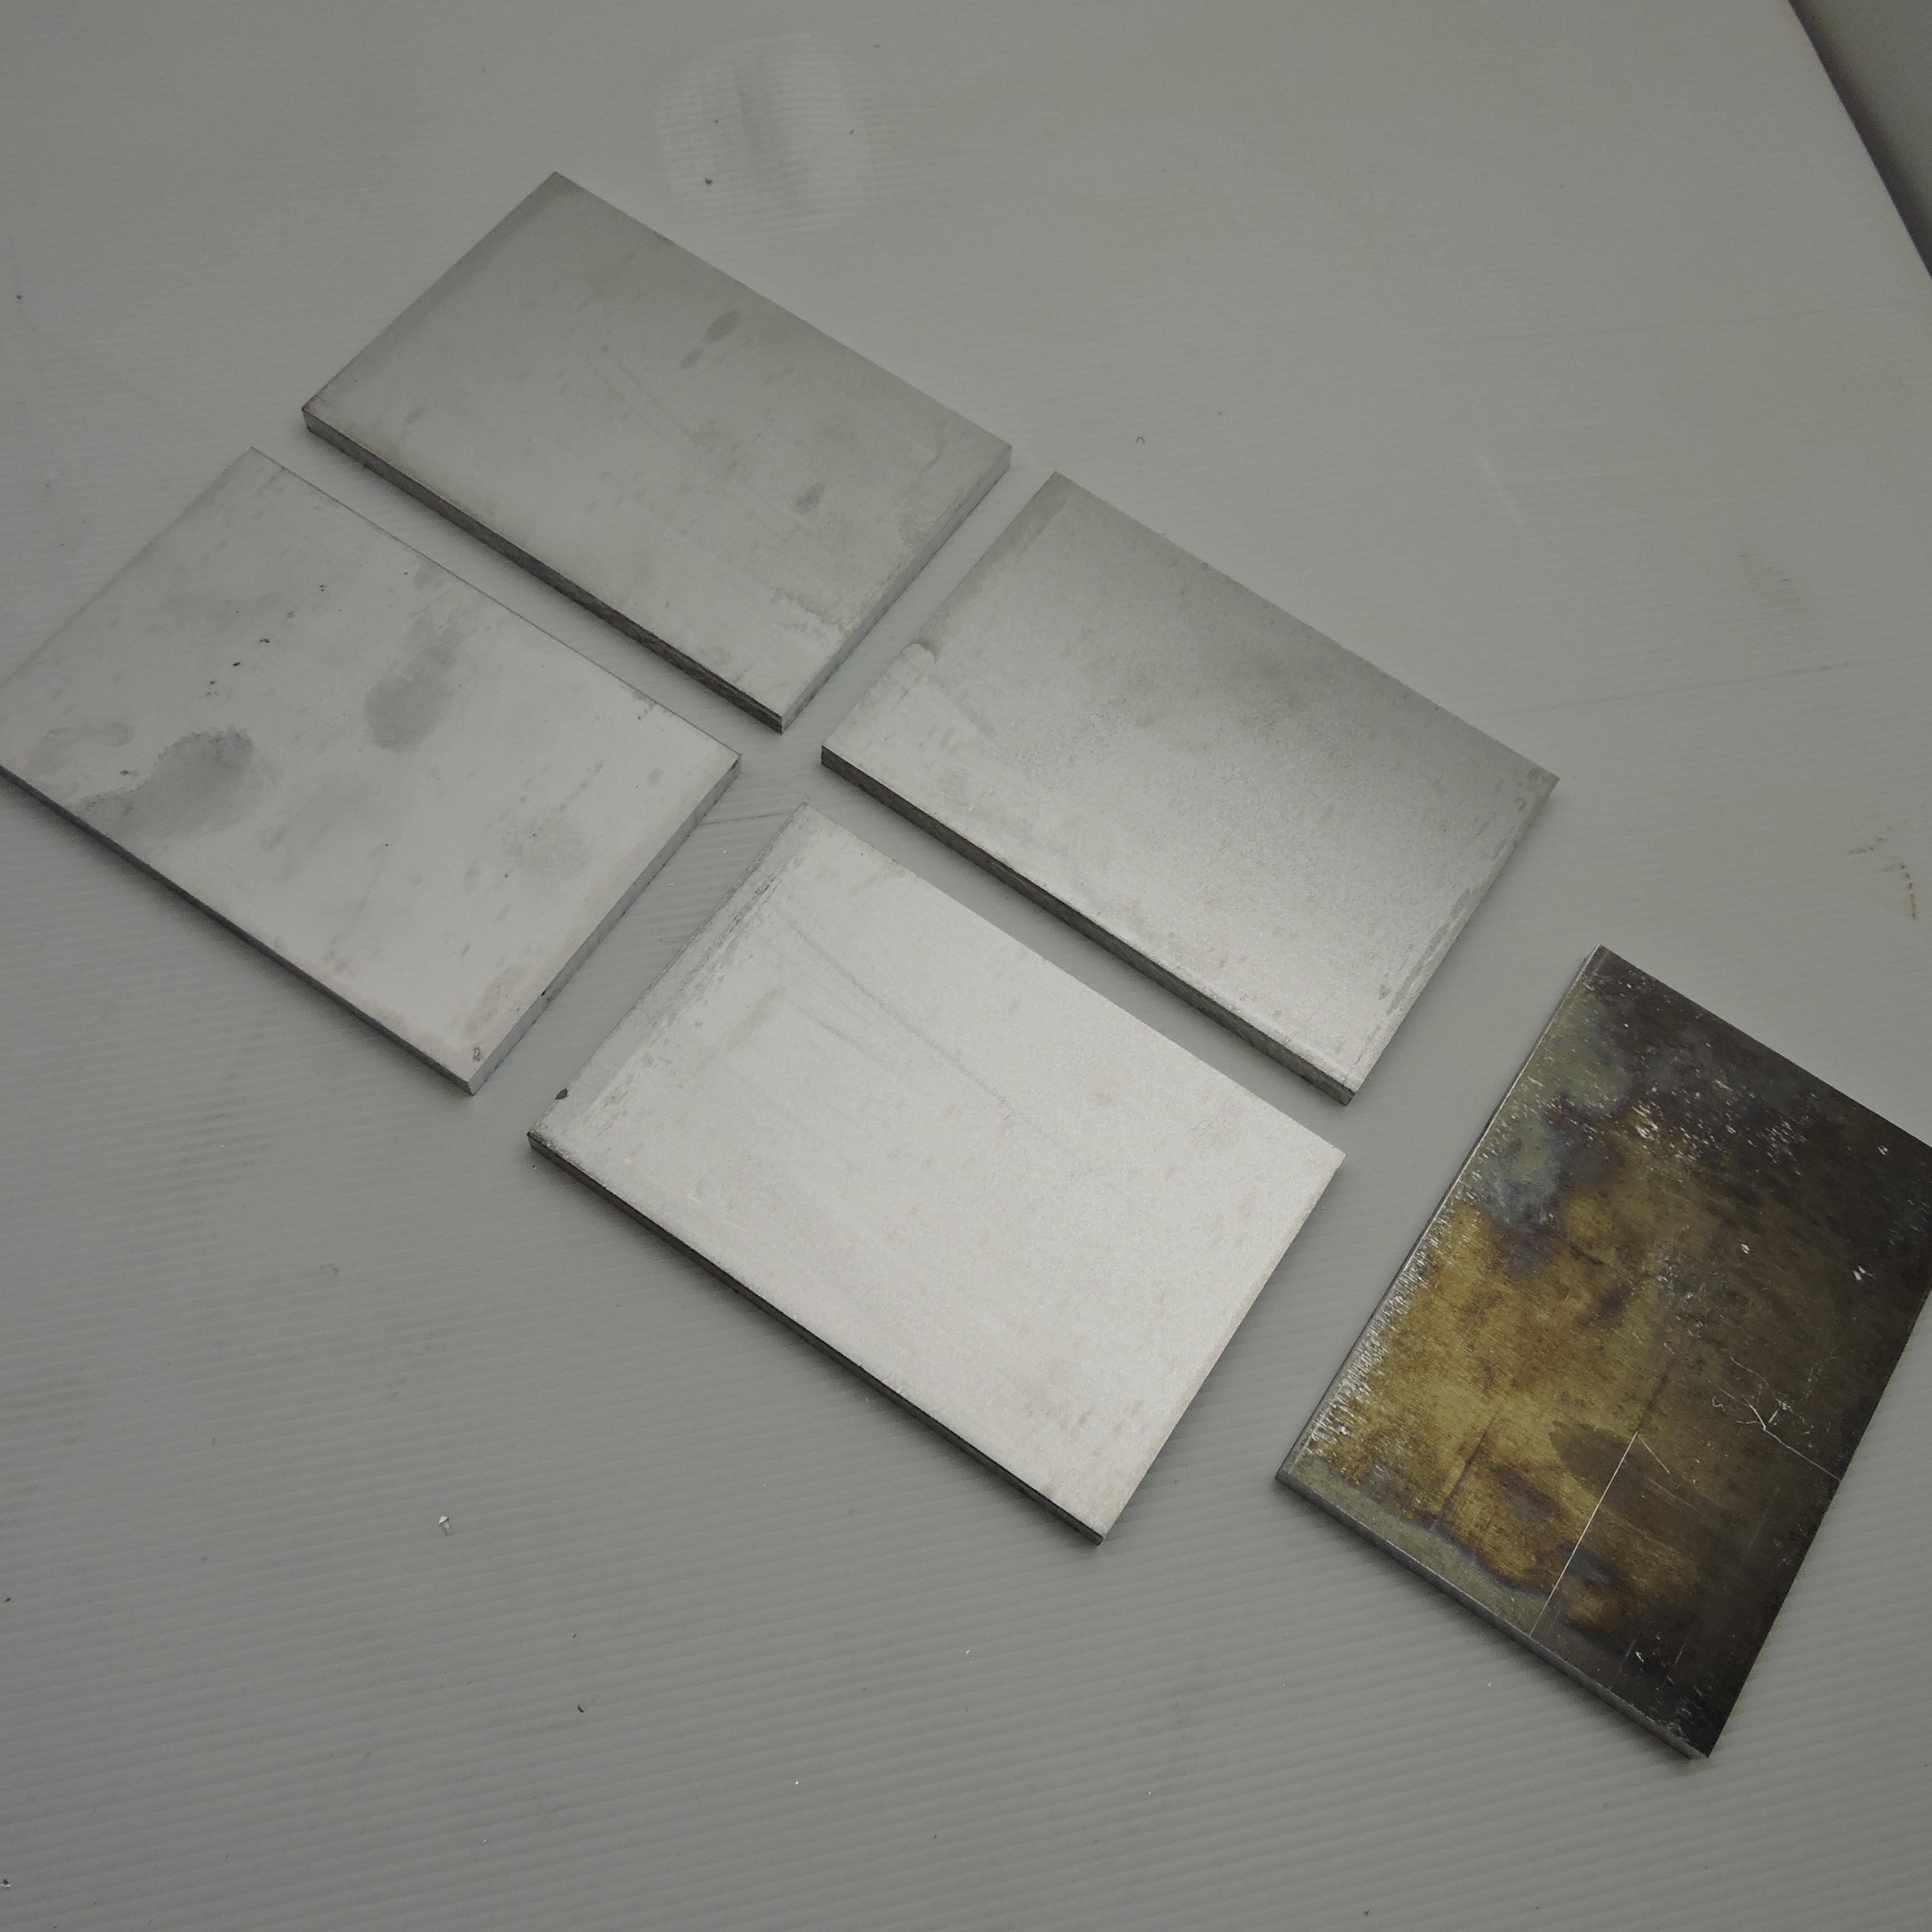 ".375/"" thick 6061 Aluminum PLATE 7.5/"" x 12.375/"" Long QTY 2 Flat Stock sku 137142"